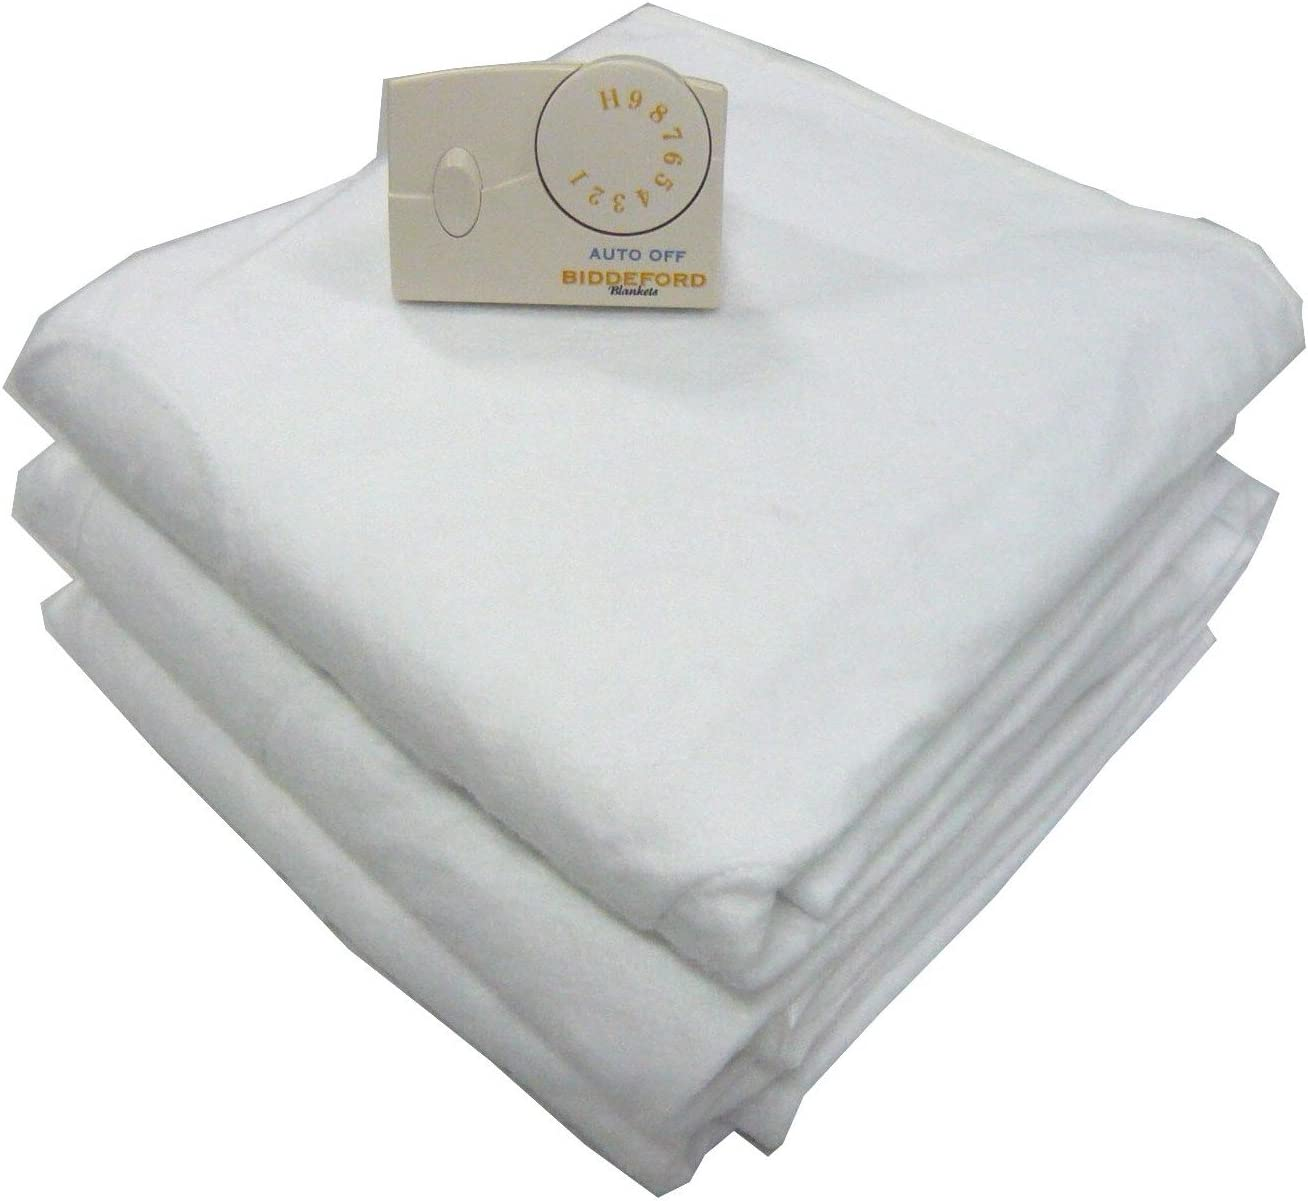 Full Biddeford Blankets Electric Heated Mattress Pad